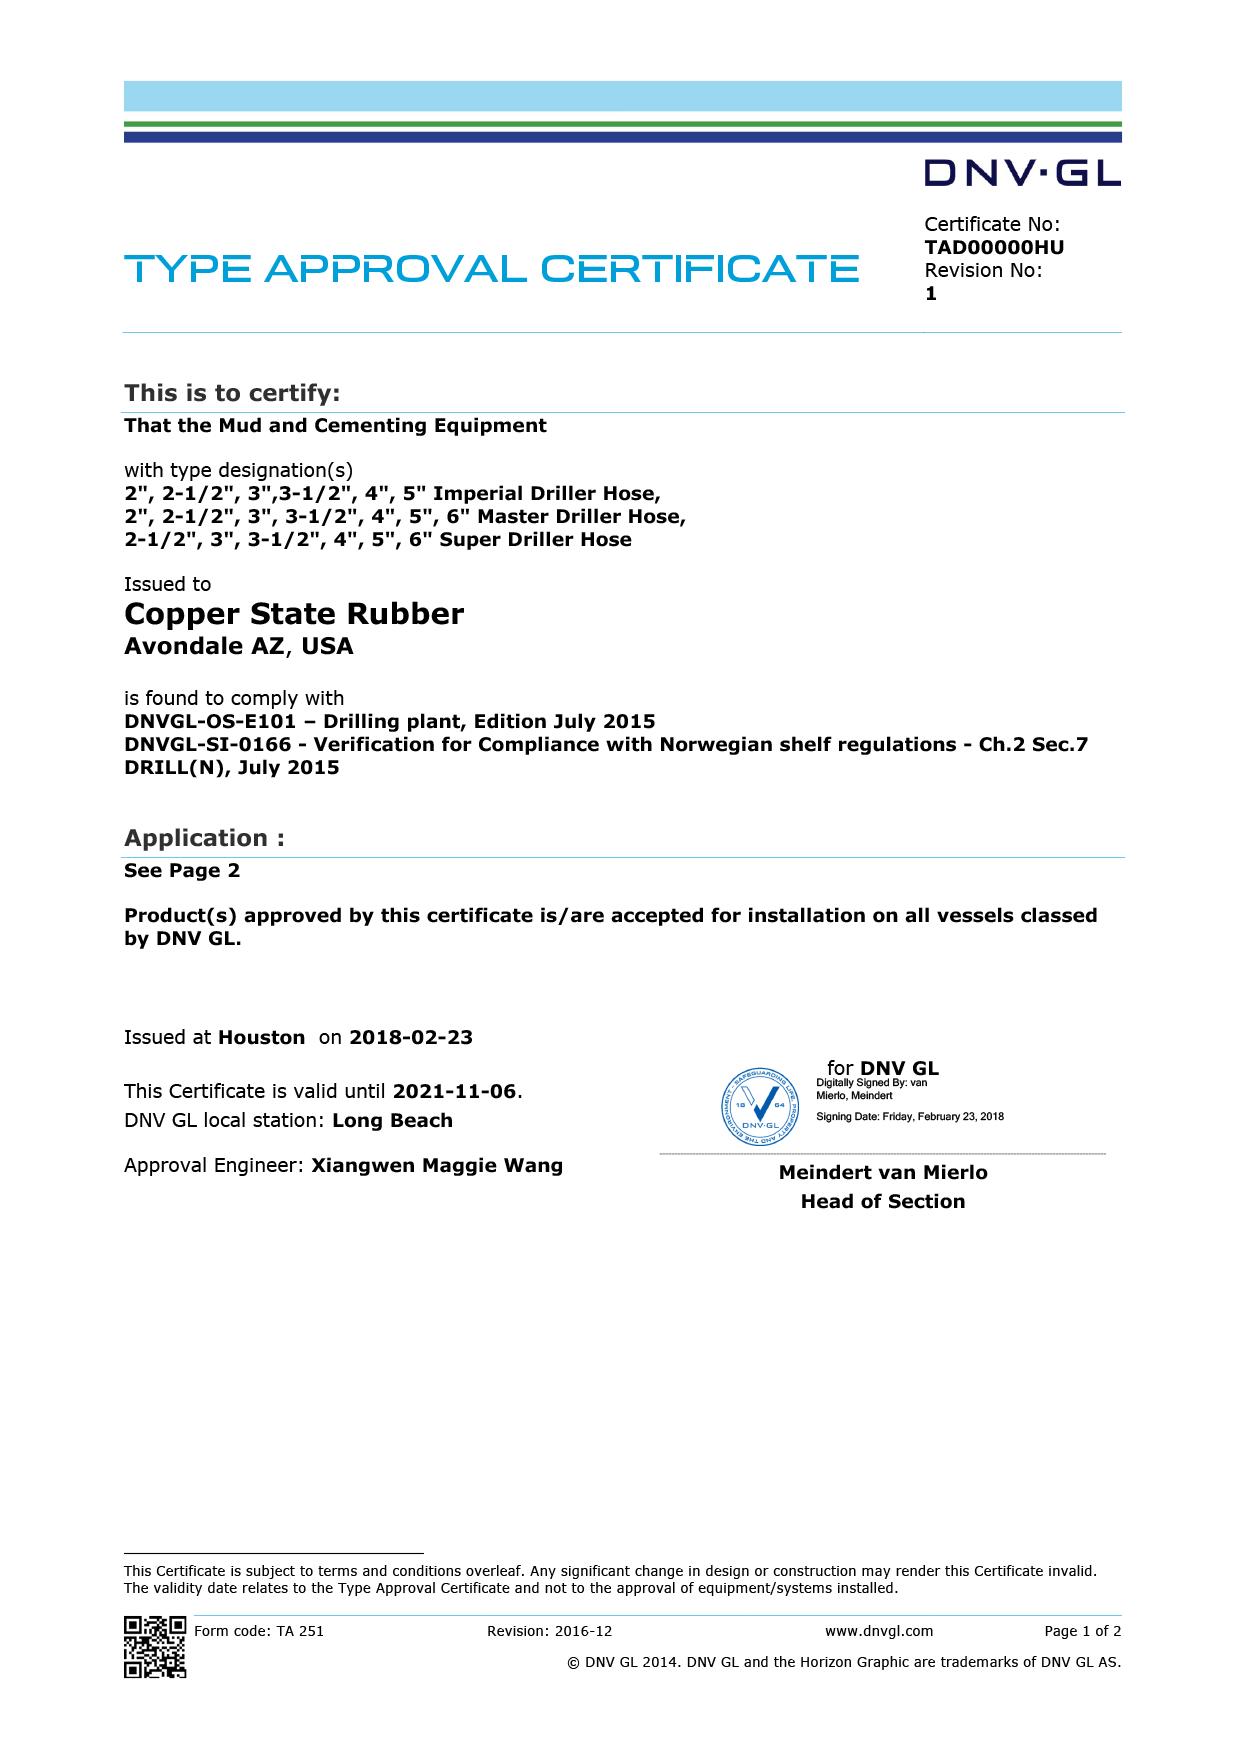 TAD00000HU Rev 1 Rotary Drilling Hose-1.png